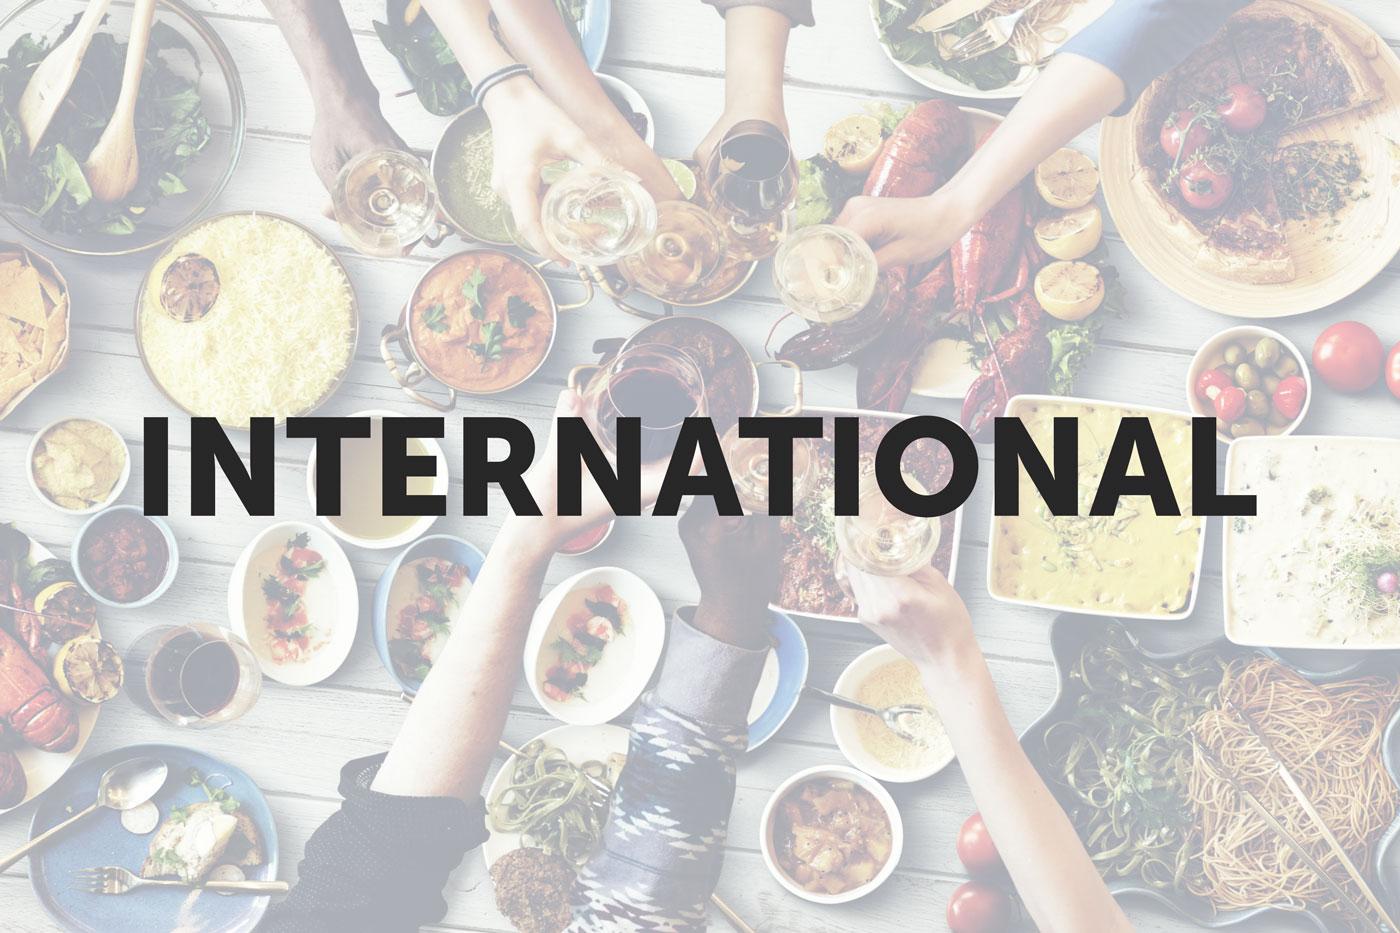 International--Buffet-at-Great-British-Restaurant